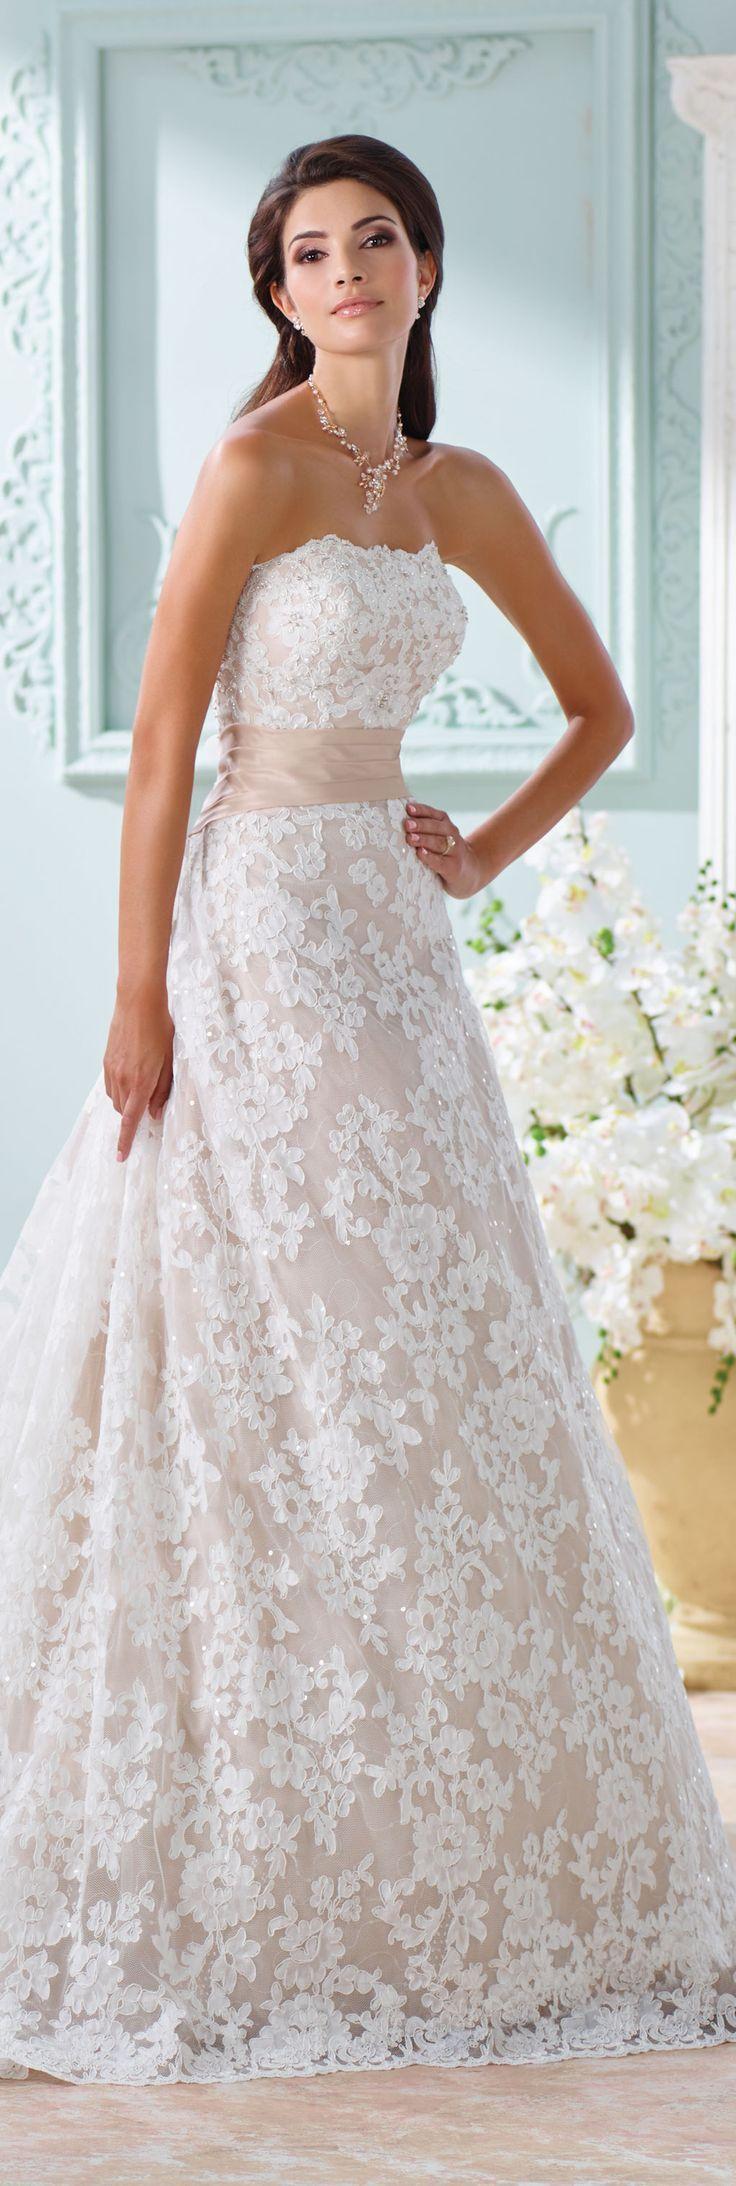 The David Tutera for Mon Cheri Spring 2016 Wedding Gown Collection - Style No. 116219 Yalene #laceweddingdress